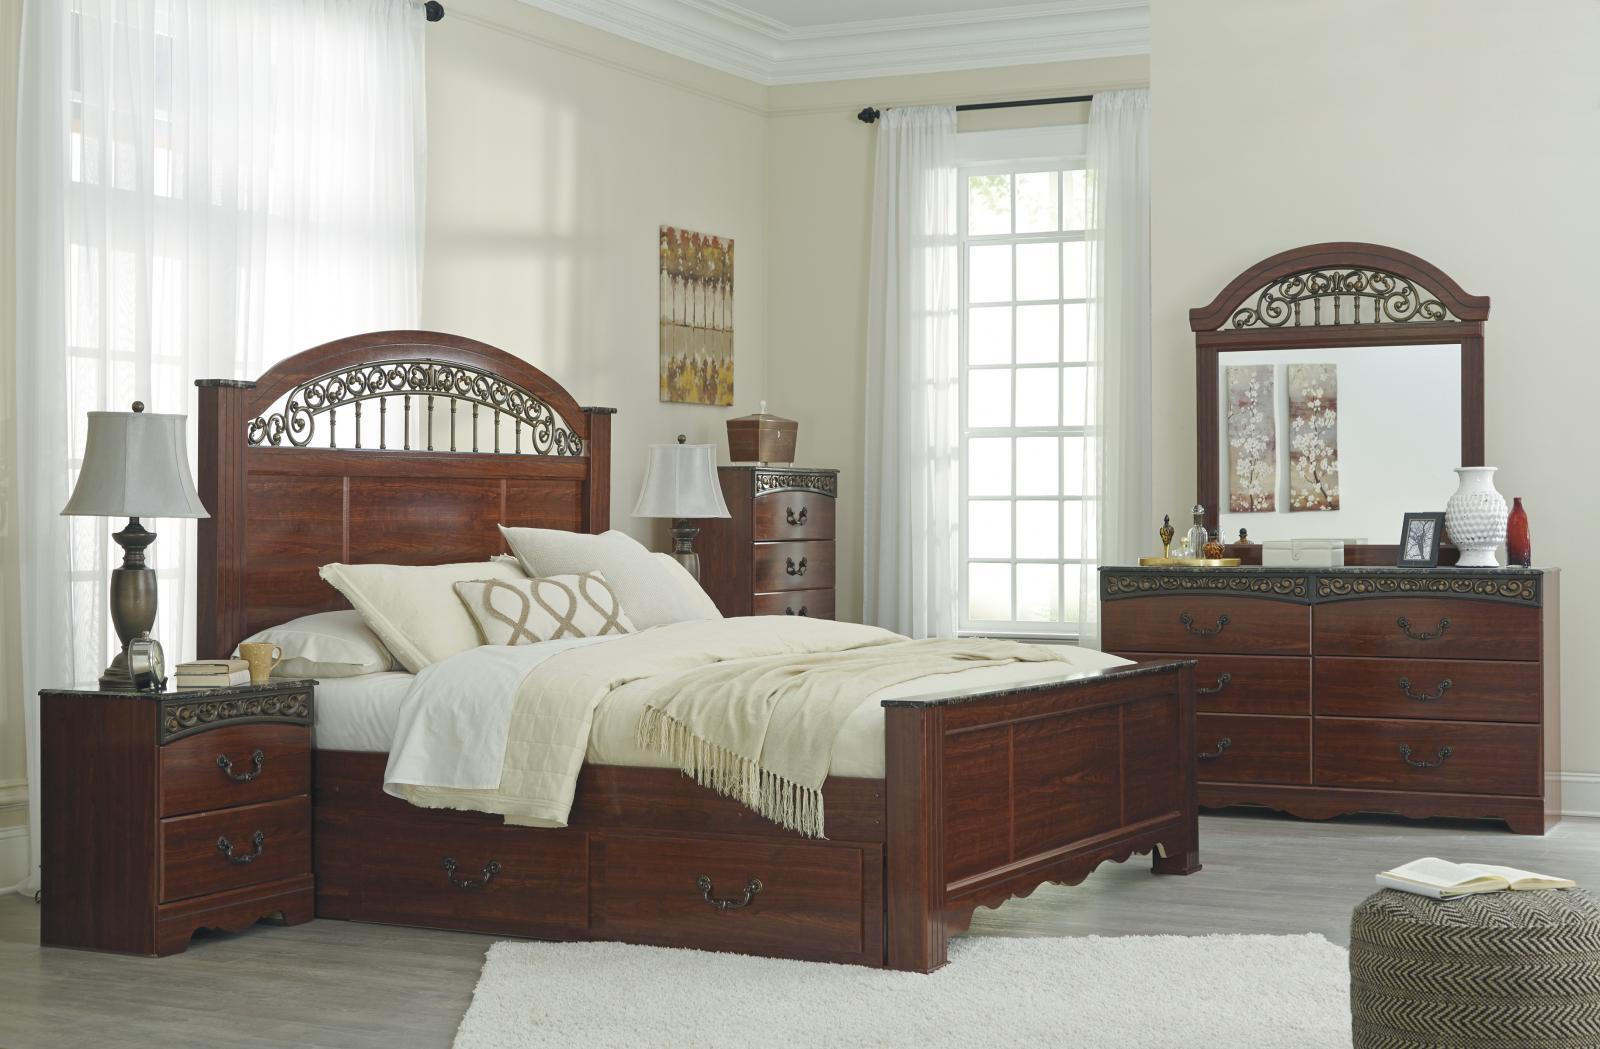 Ashley Fairbrooks Estate B105 Queen Size Poster Bedroom Set 5pcs Traditional Bedroom Sets